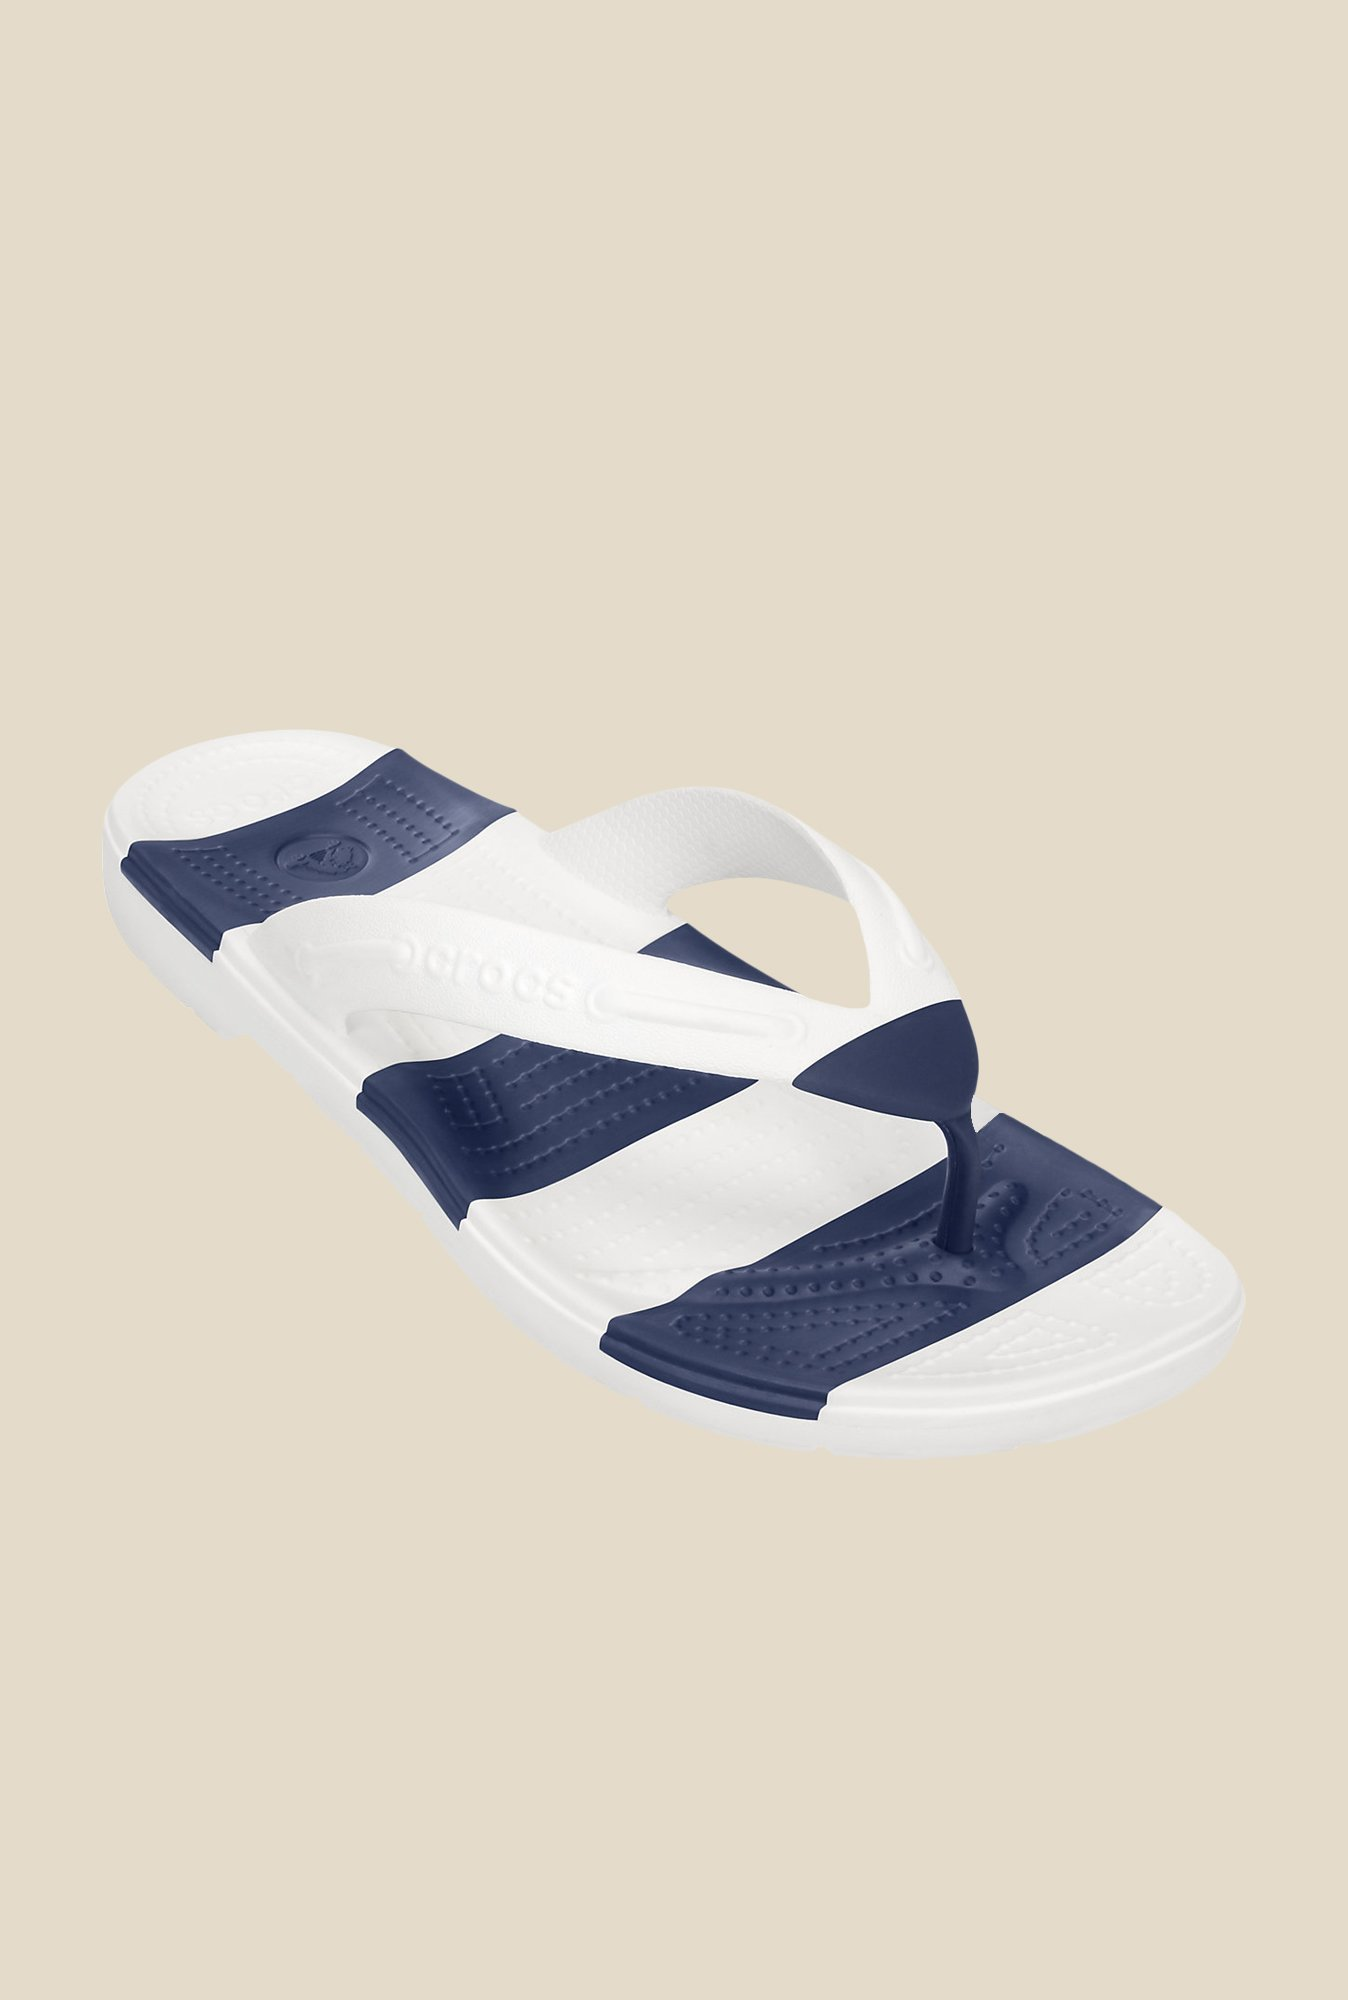 d61dcfd48f0c0 Buy Crocs Beach Line White   Navy Flip Flops Online at best price at  TataCLiQ